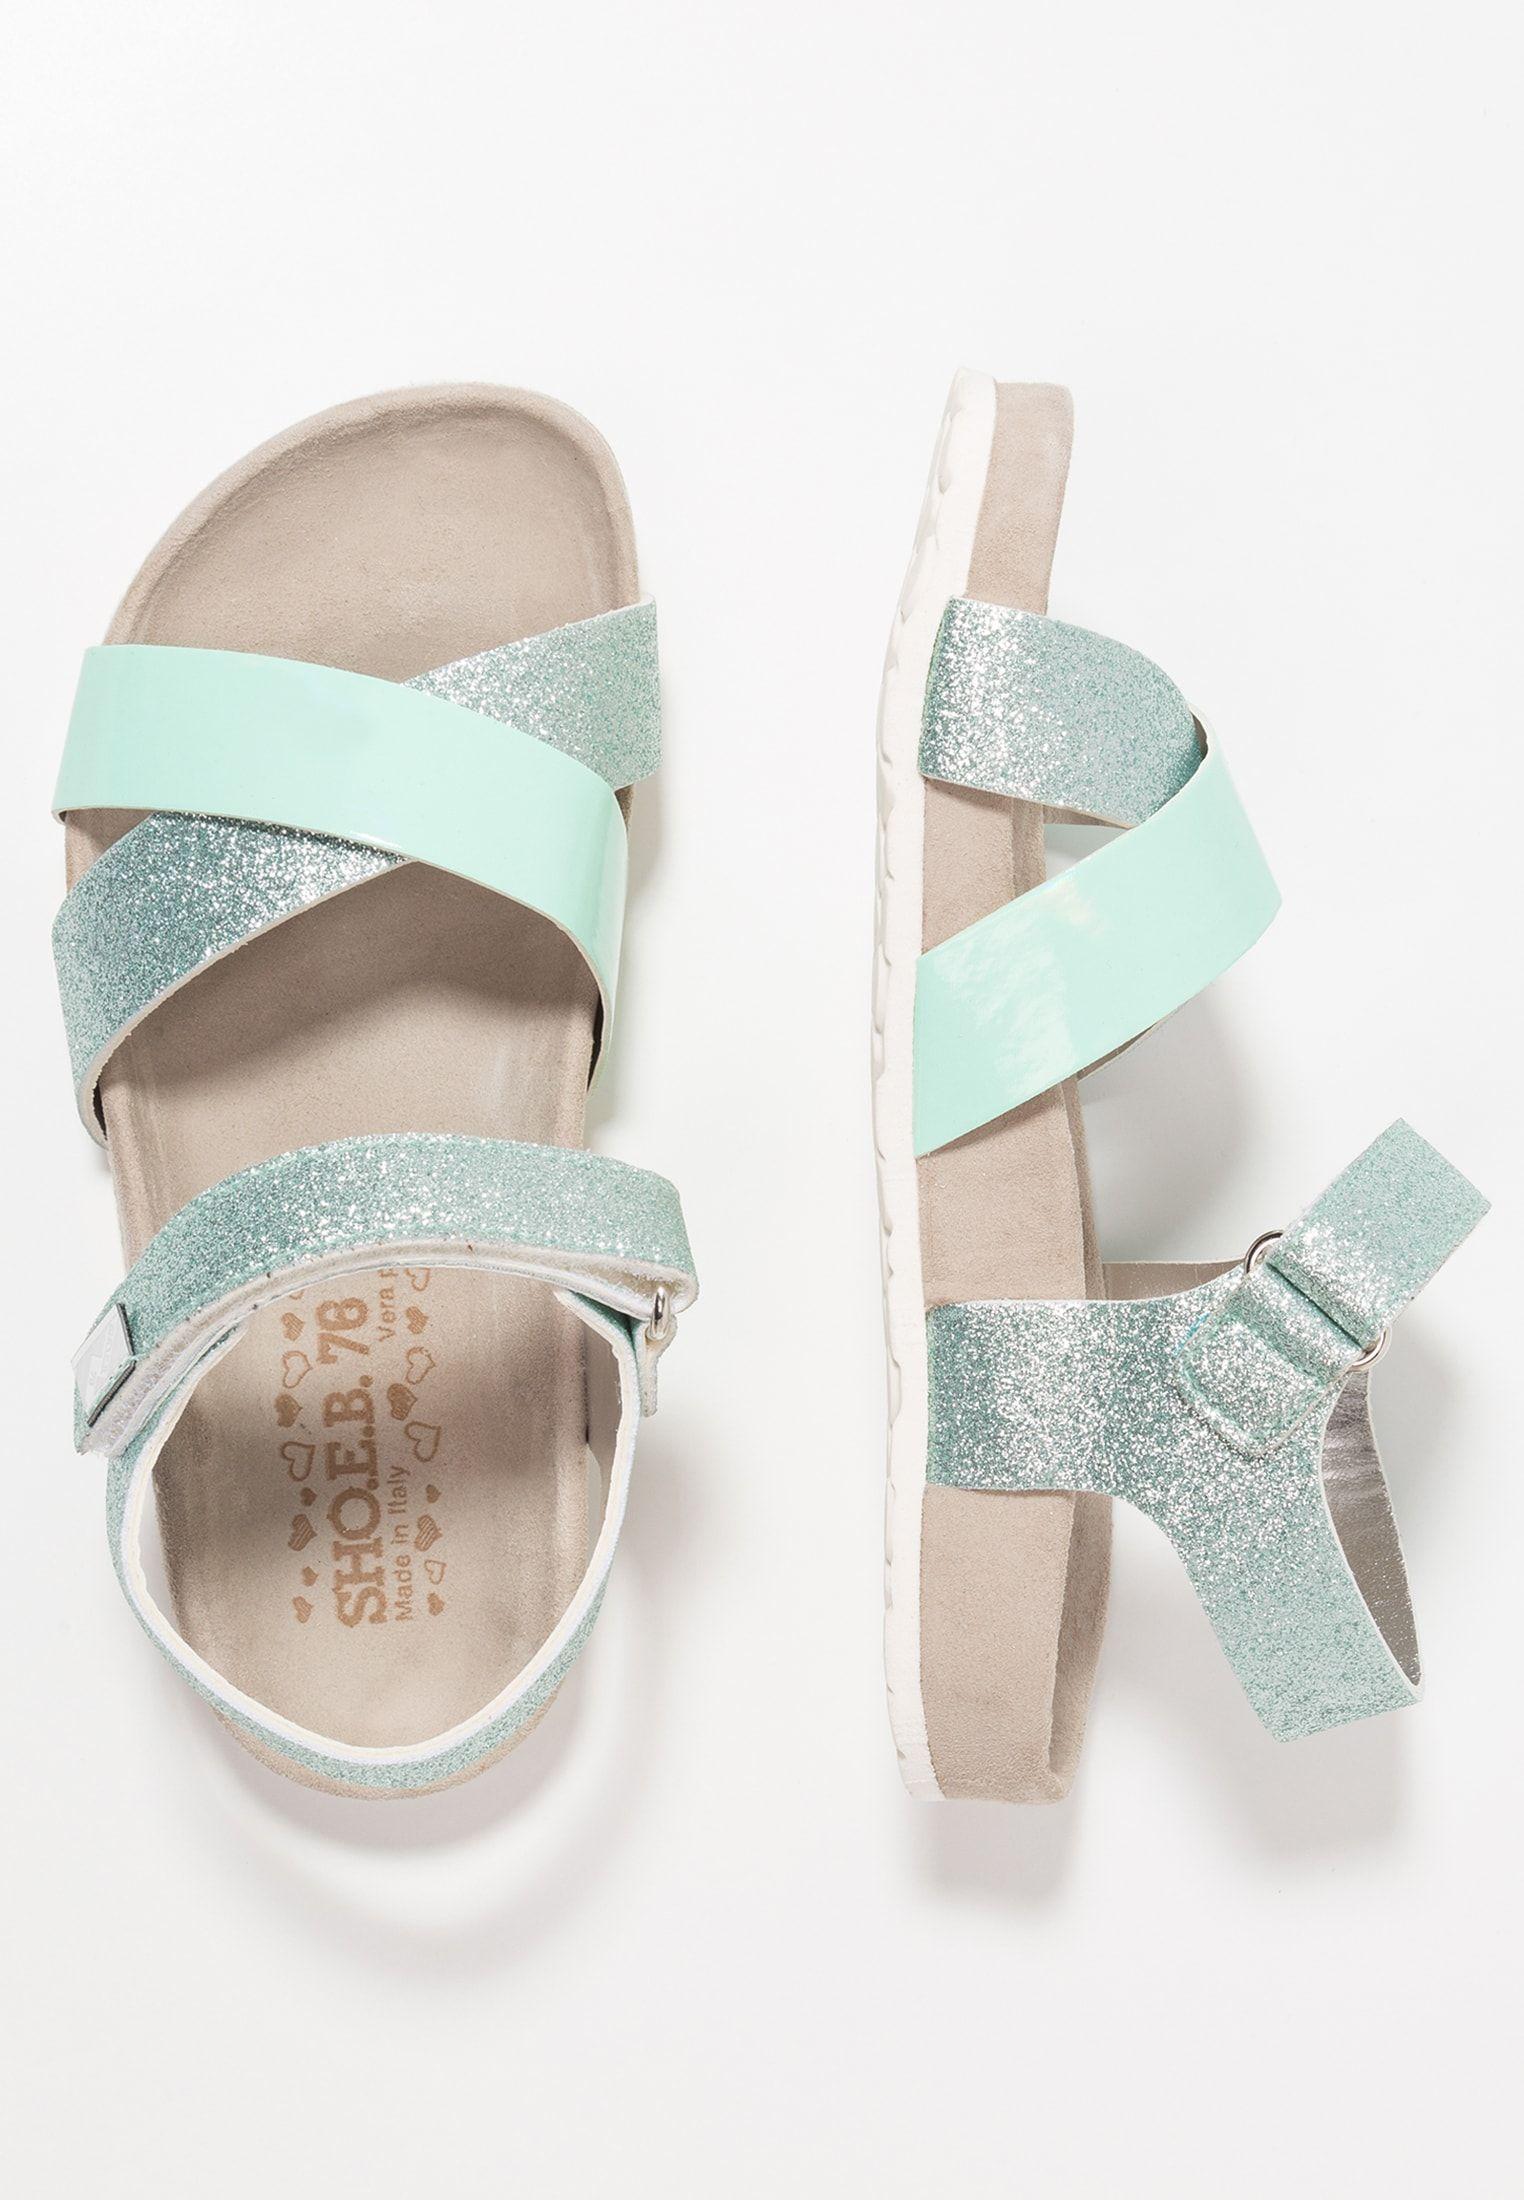 Shoeb76 Belt Sandal Turquoise Zalando De Sandalias Zapatos